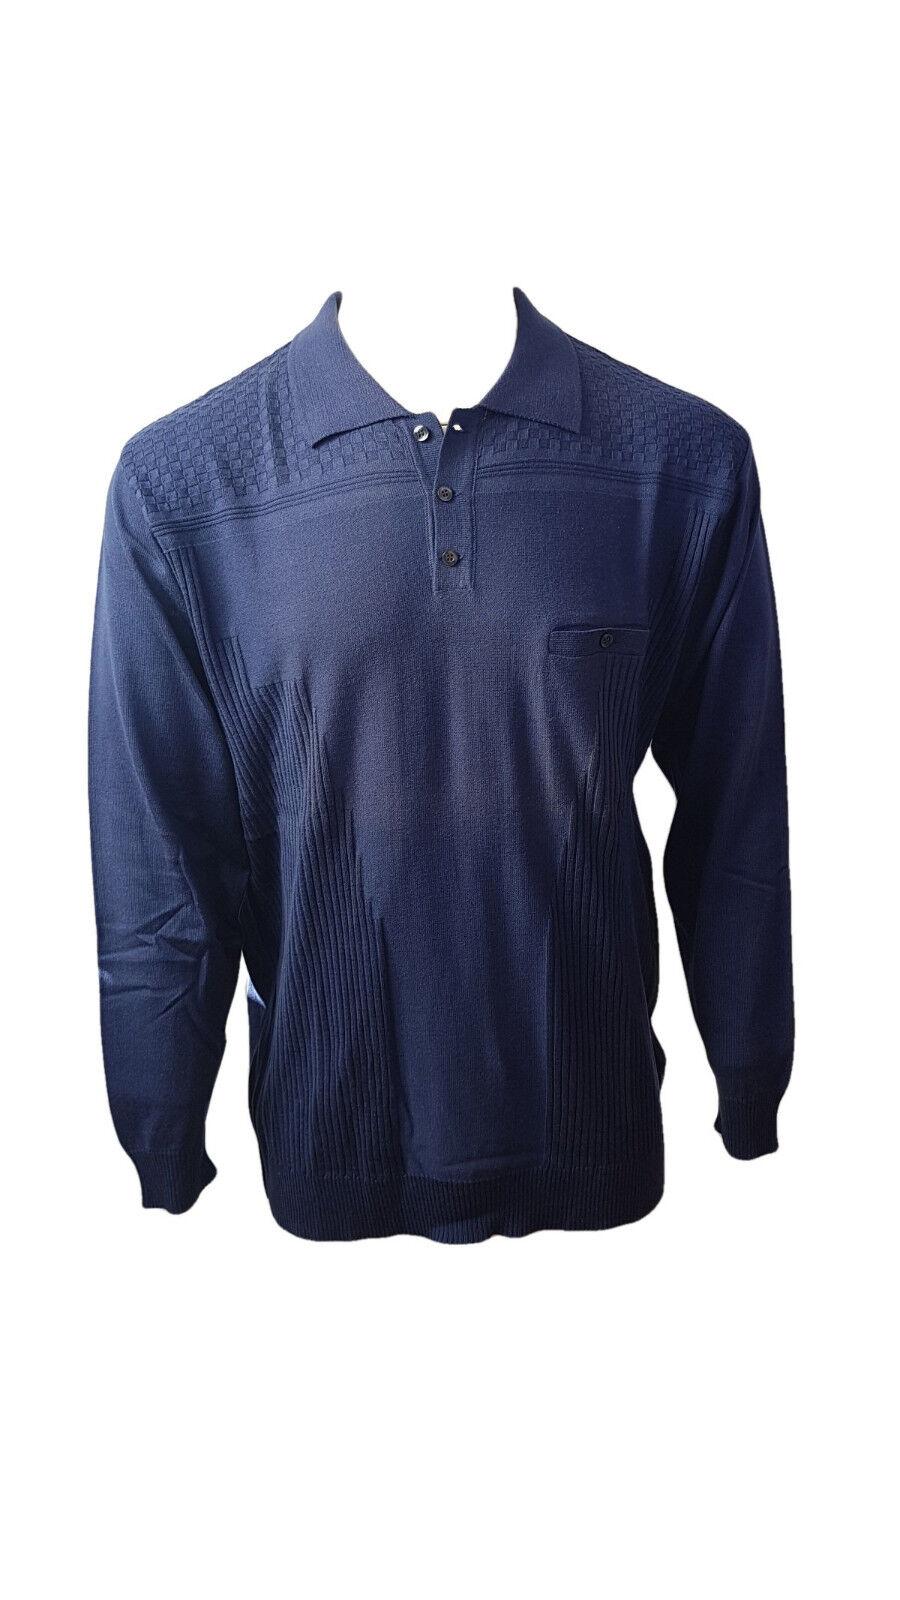 Pull BERAC col polo boutonné 8160 blue indigo T. 2 (S) Prix. Maga.